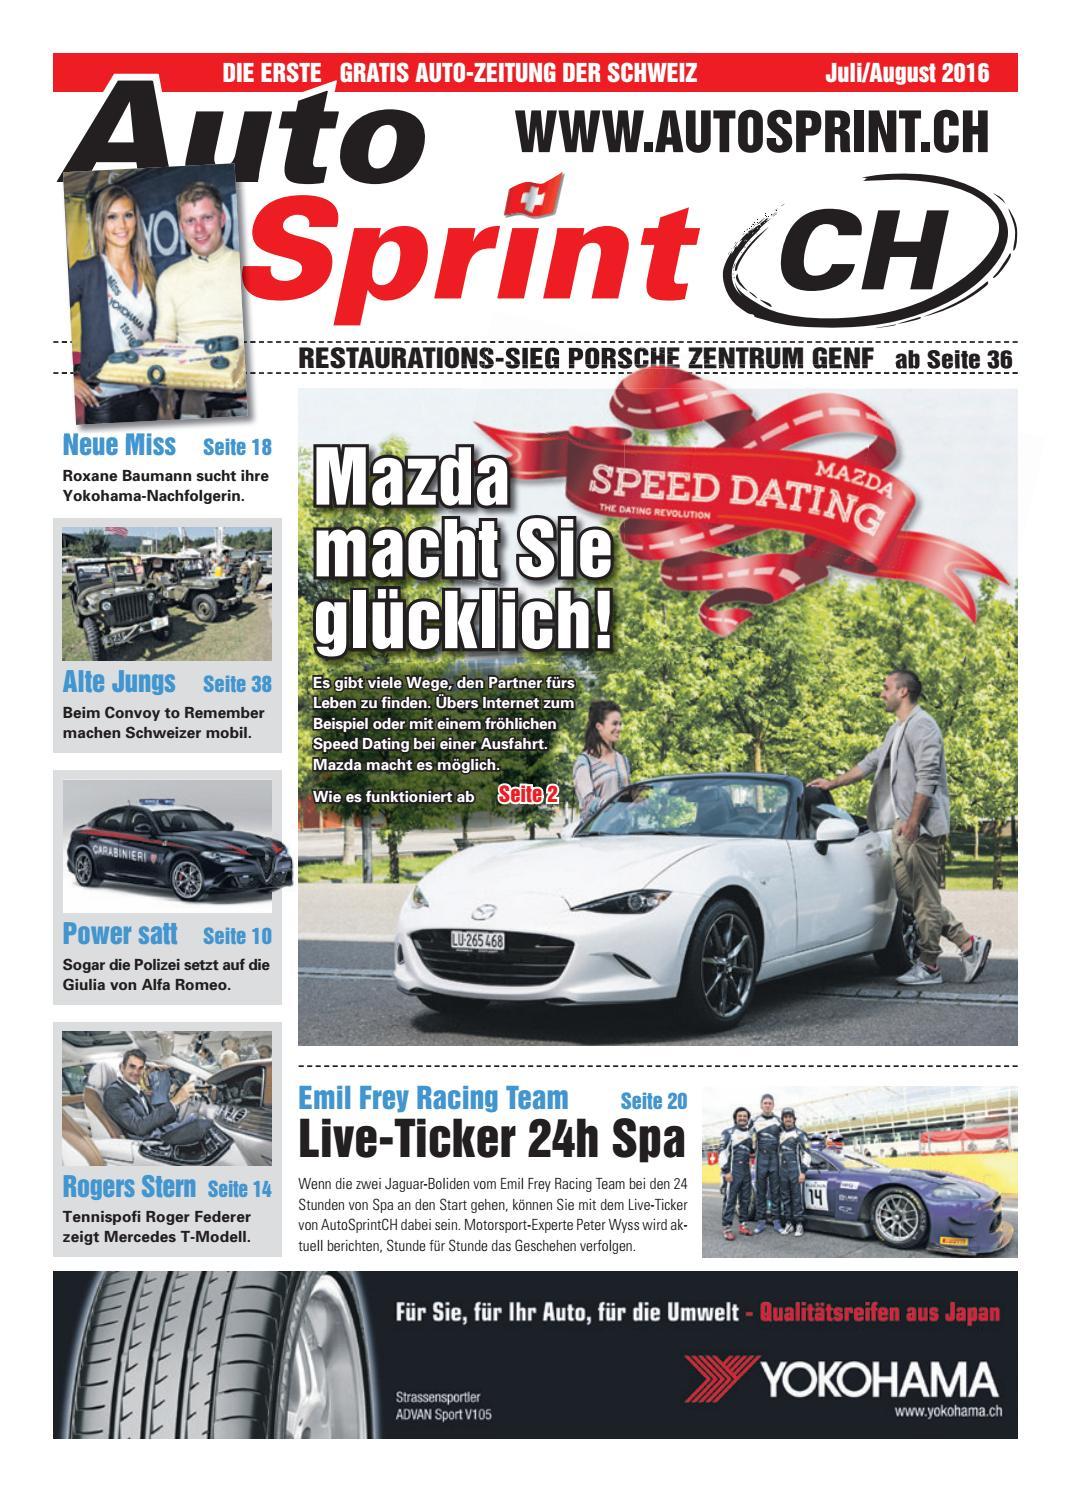 2016 07 Autosprint De By Autosprintch Issuu